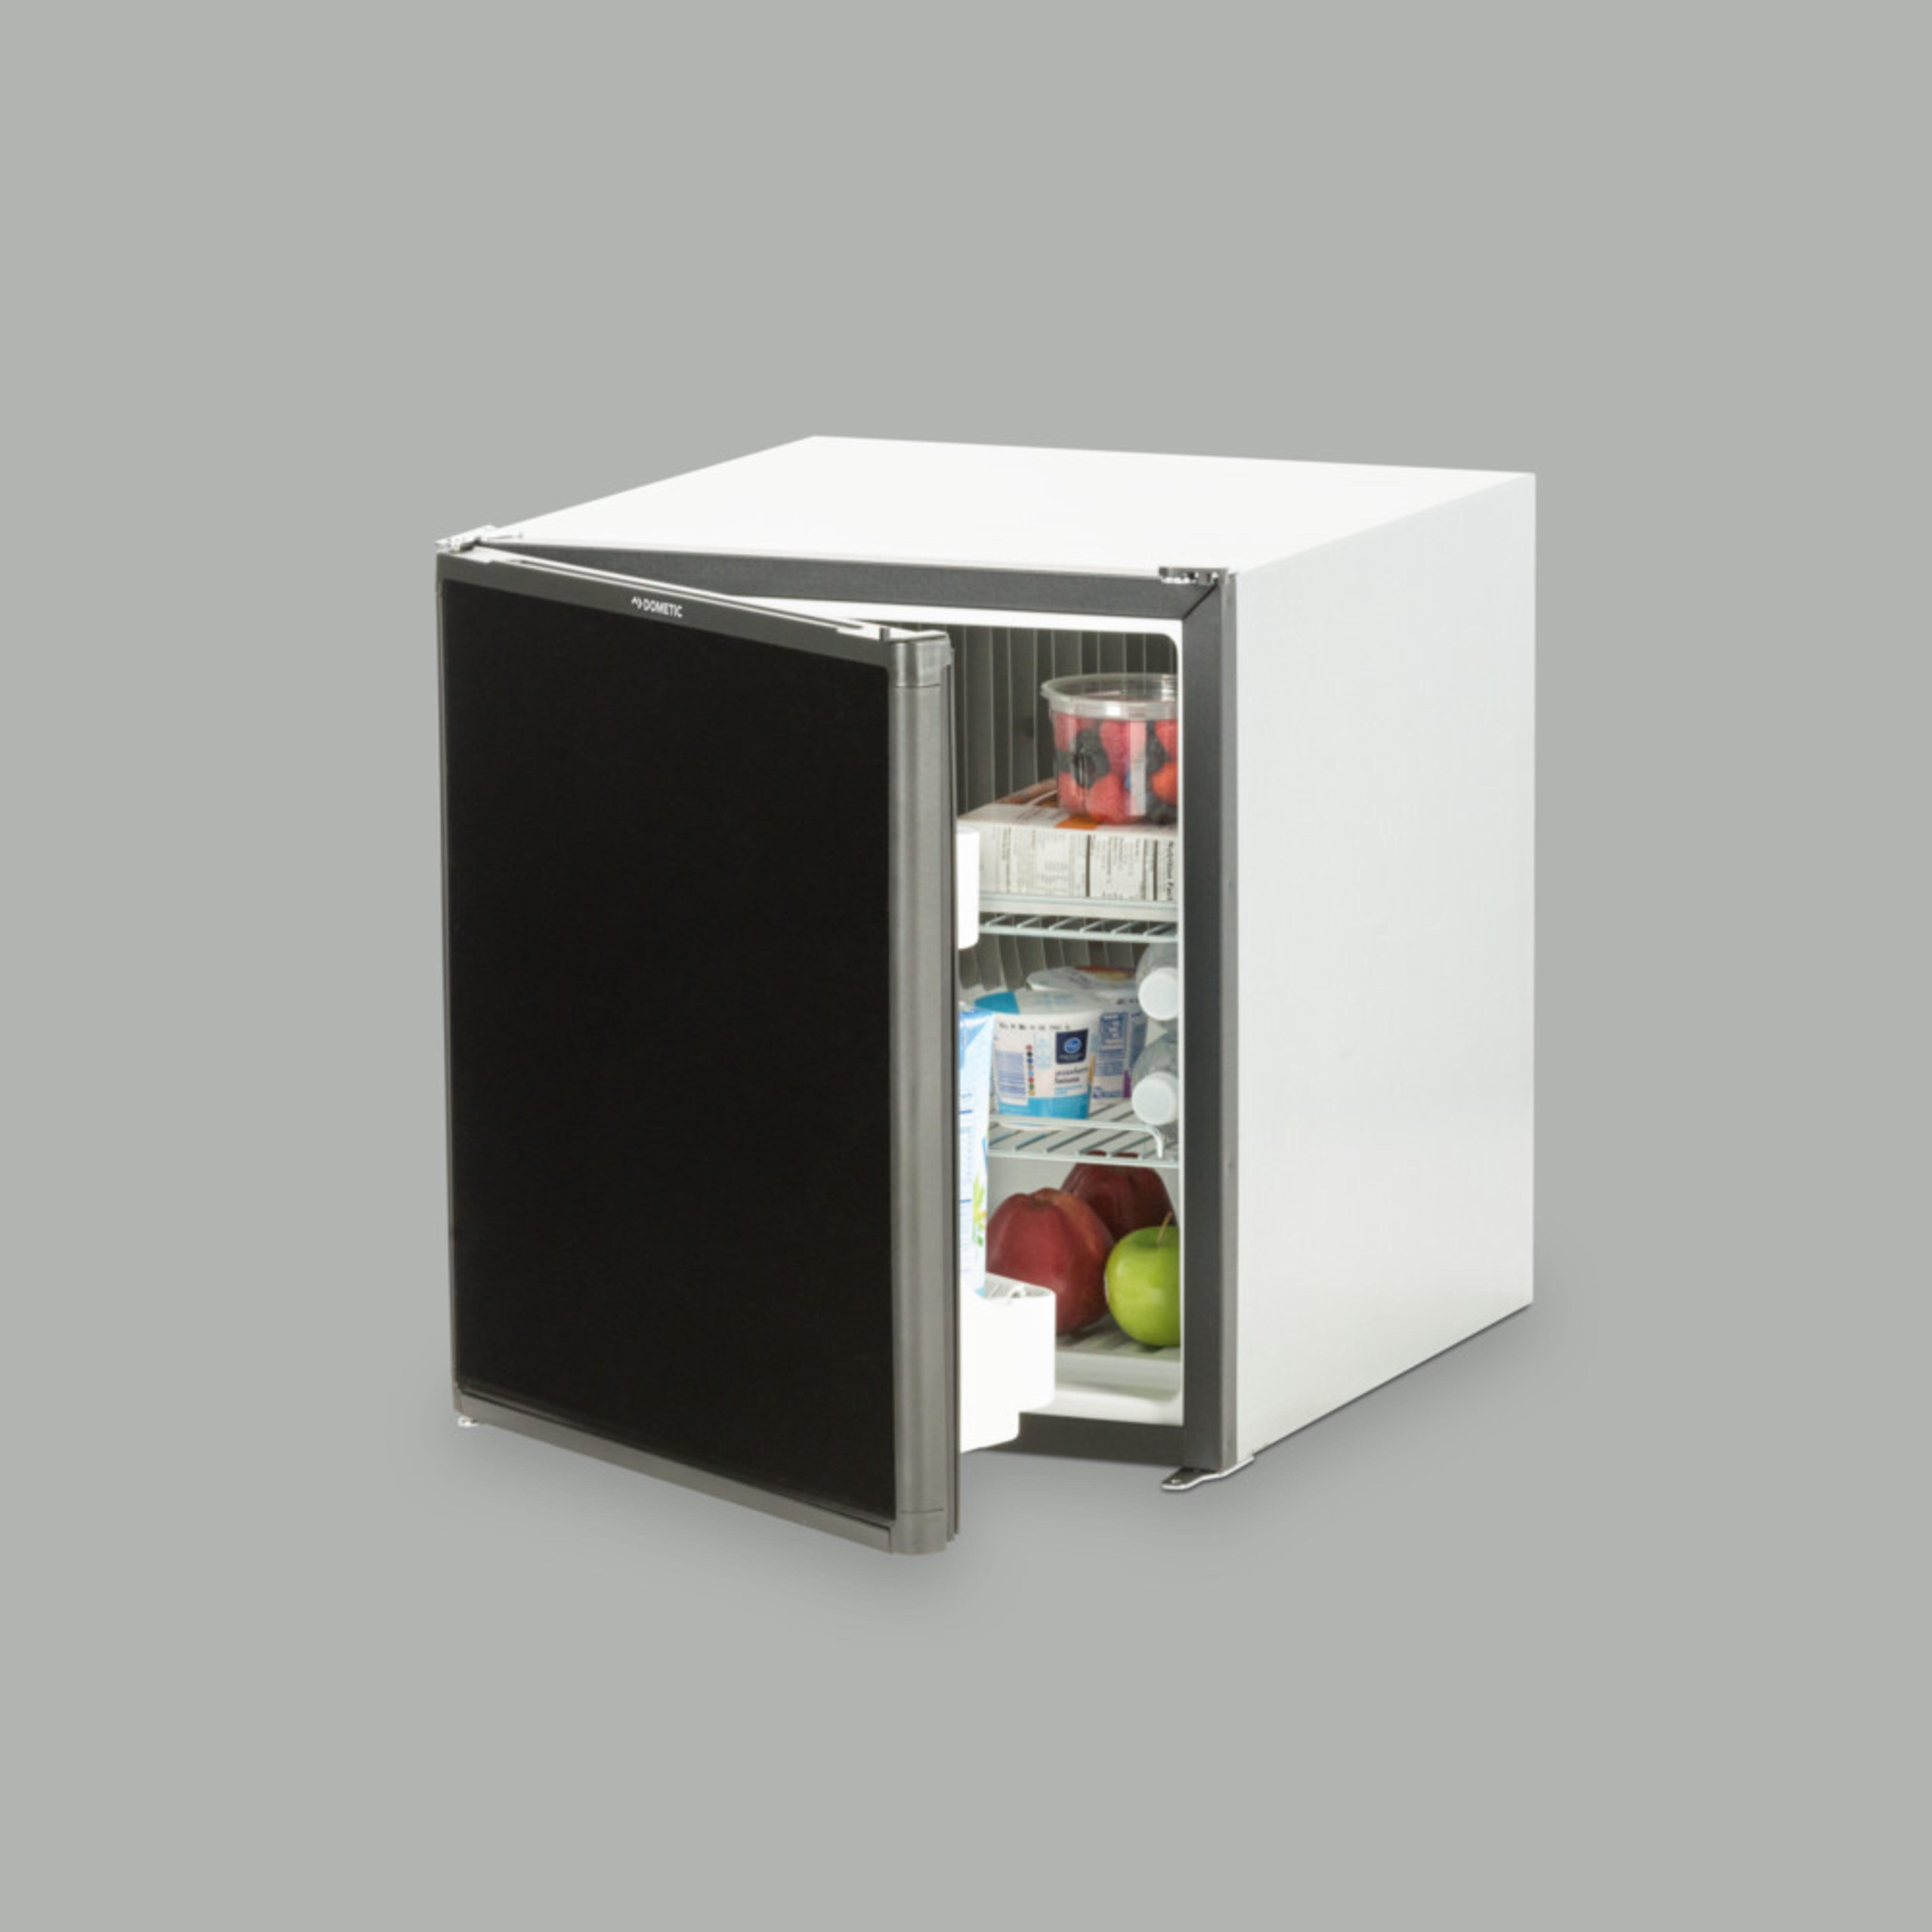 Dometic Compact Refrigerator